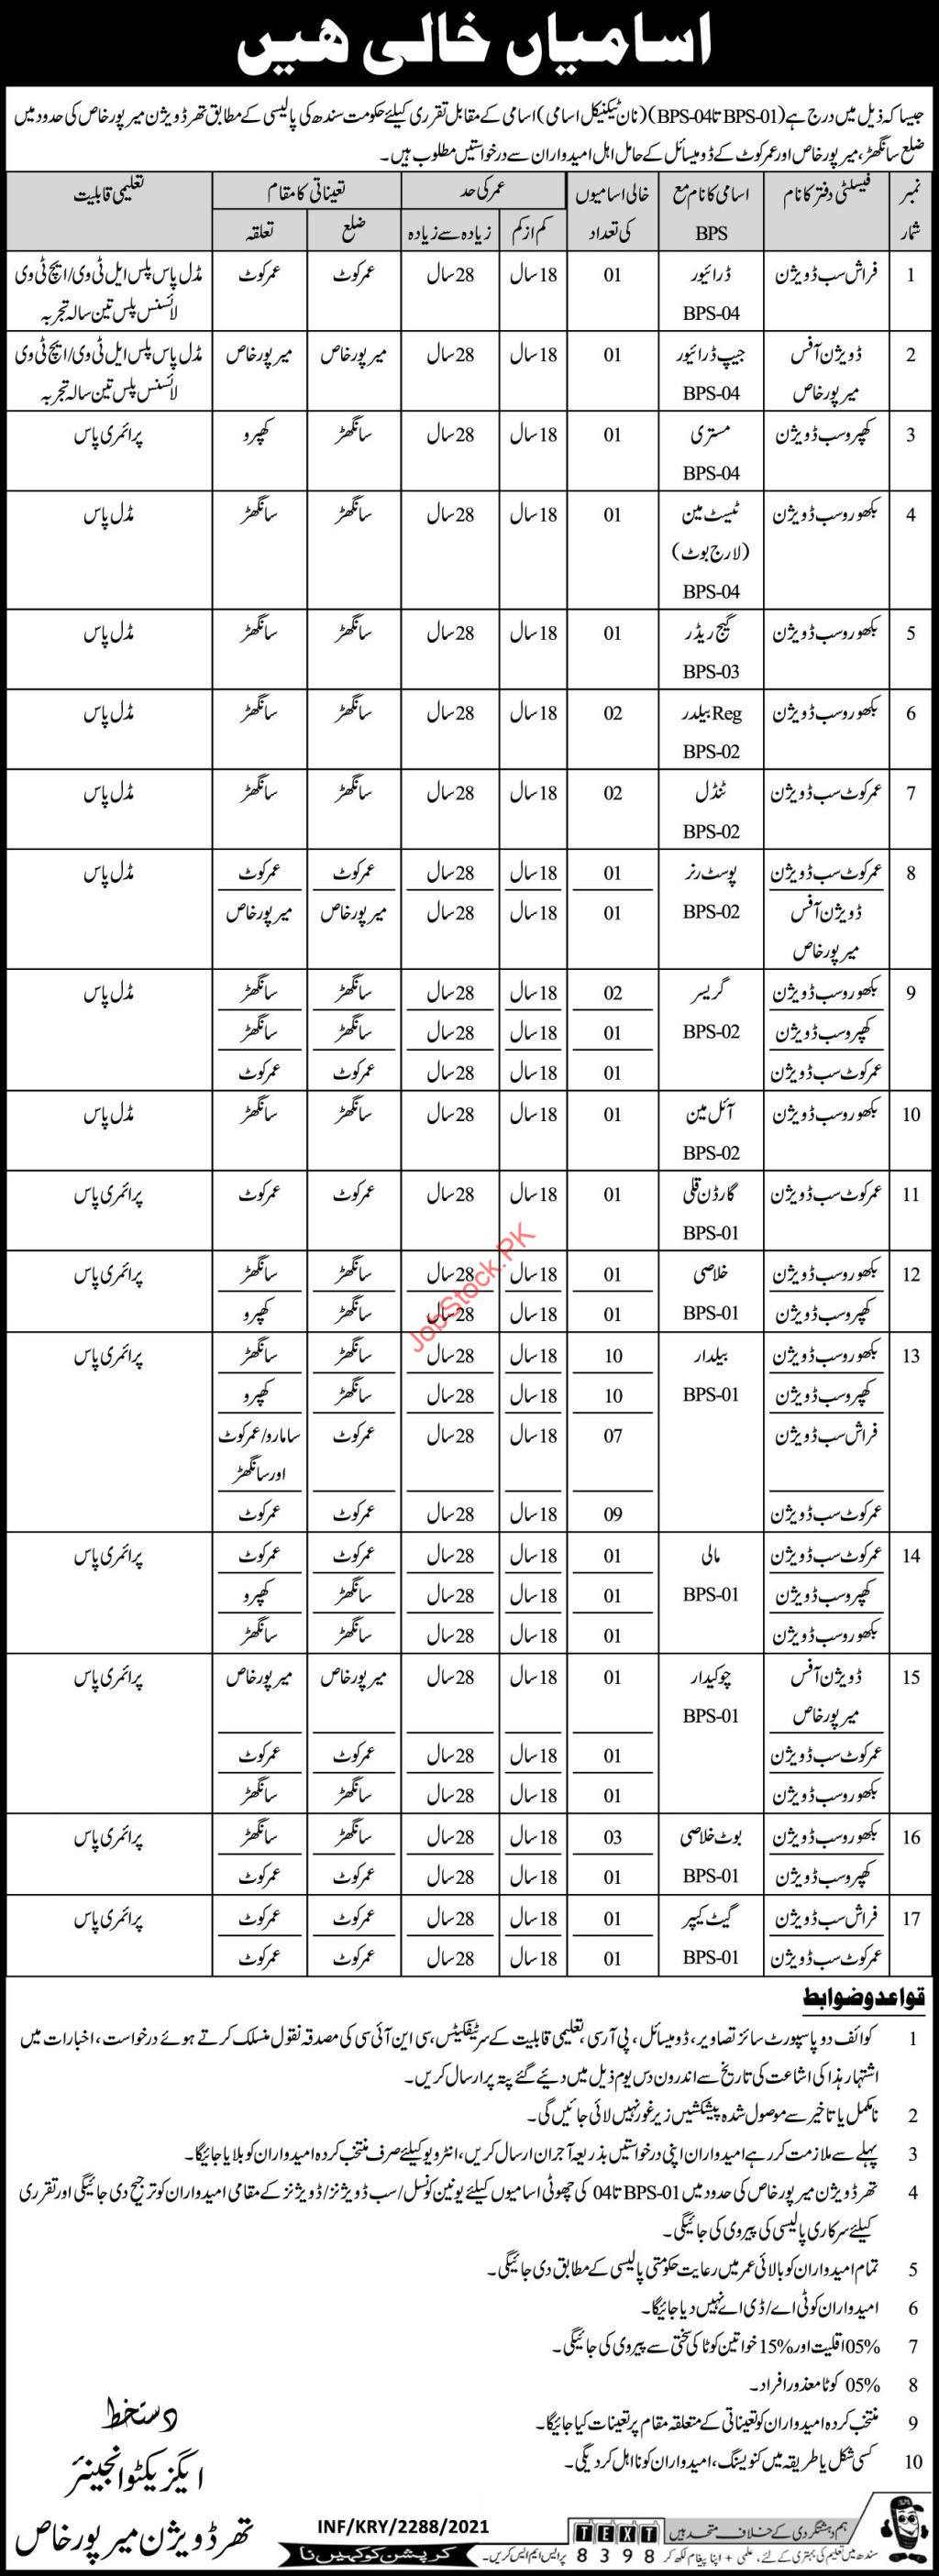 Latest Mirpurkhas Jobs Adbertisement June 2021